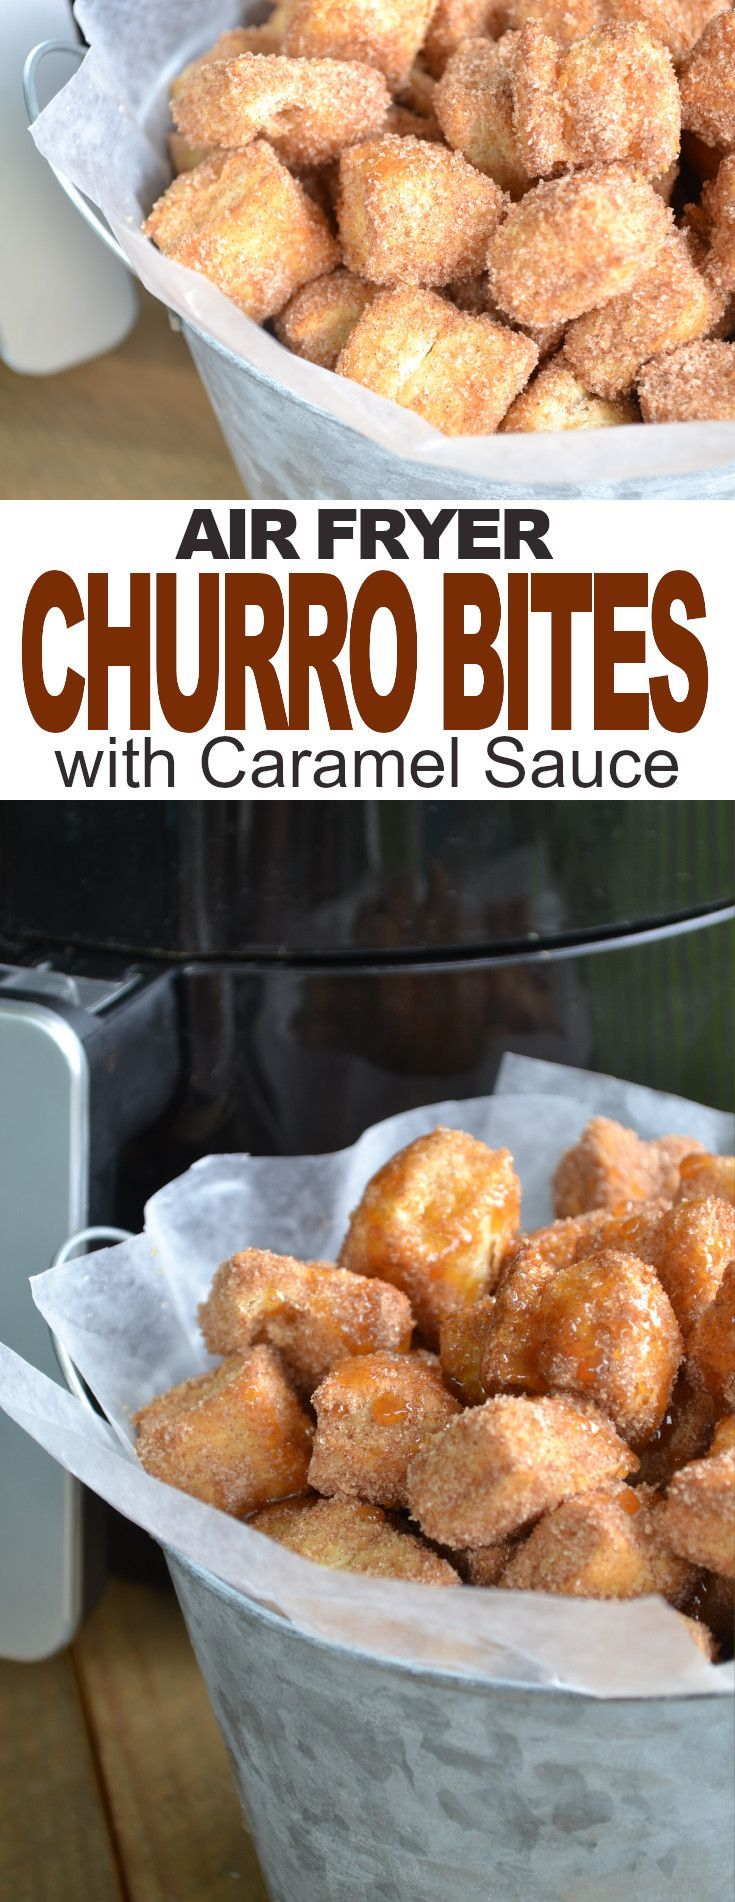 Air Fryer Cinnamon Bites with Caramel Sauce